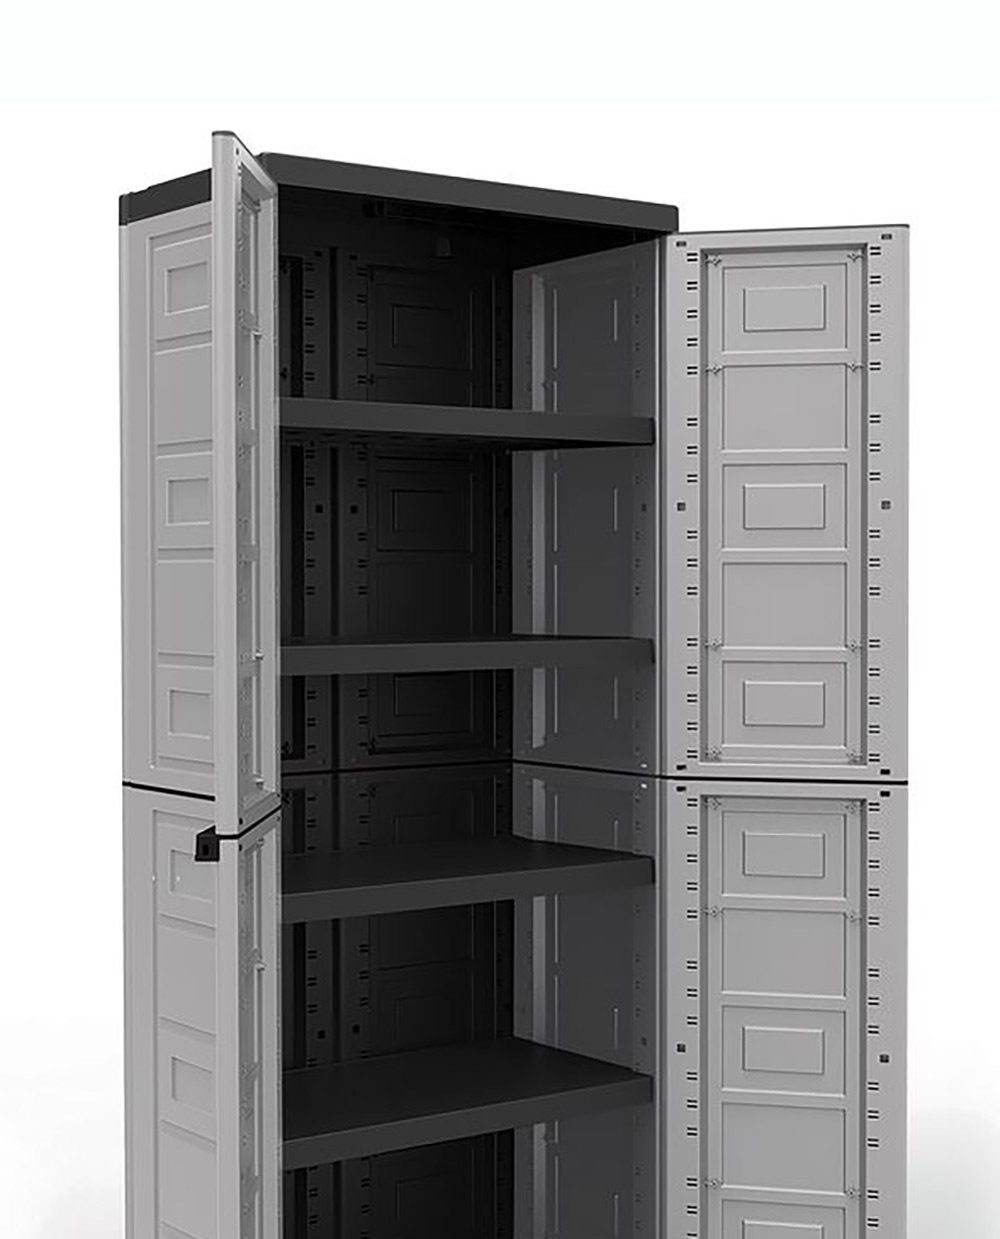 Plastic Kitchen Shelf: Contico 4 Shelf Plastic Garage Storage Organizer Base